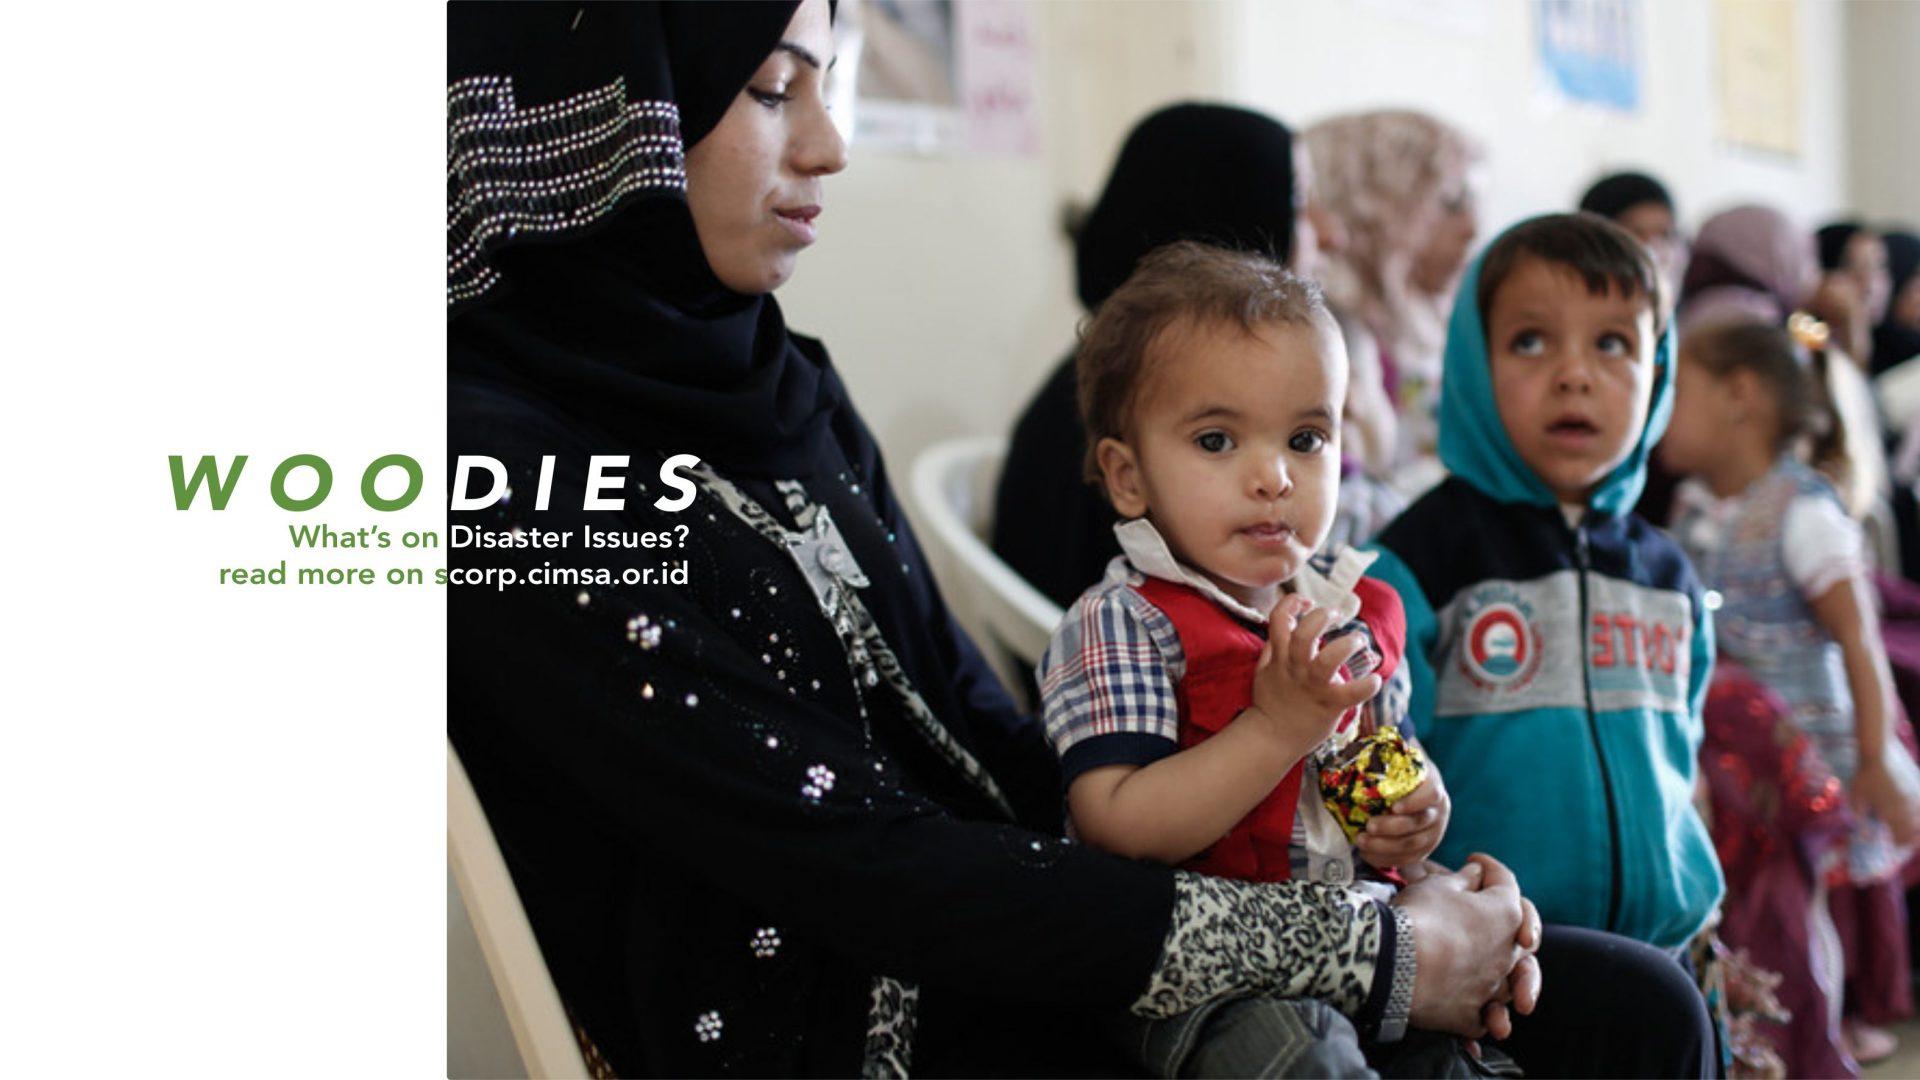 WOODIES – Refugees Health